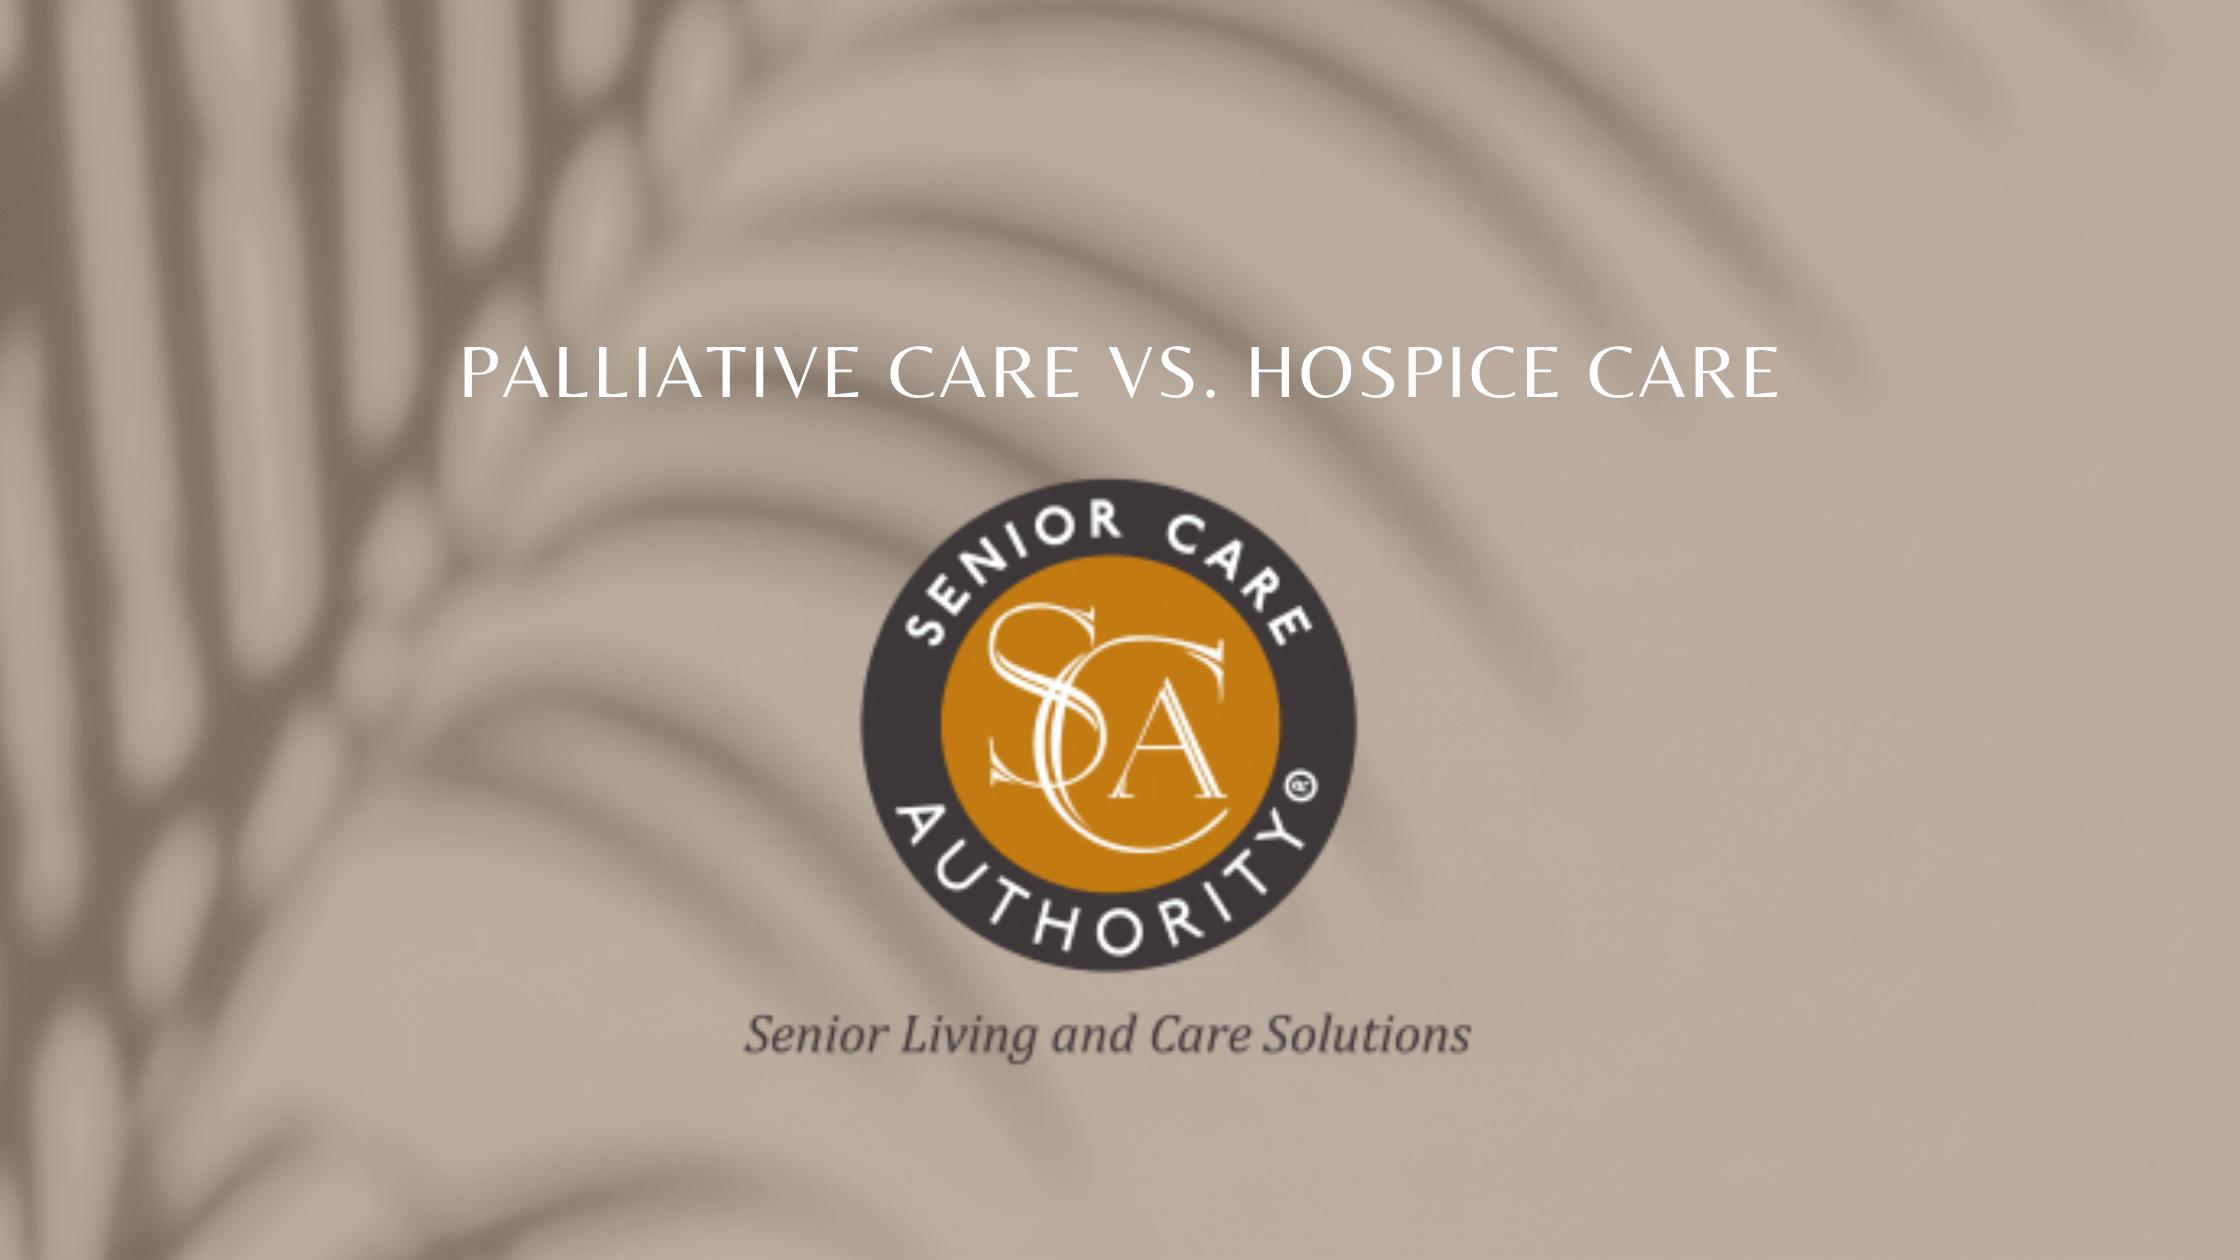 Palliative Care Vs. Hospice